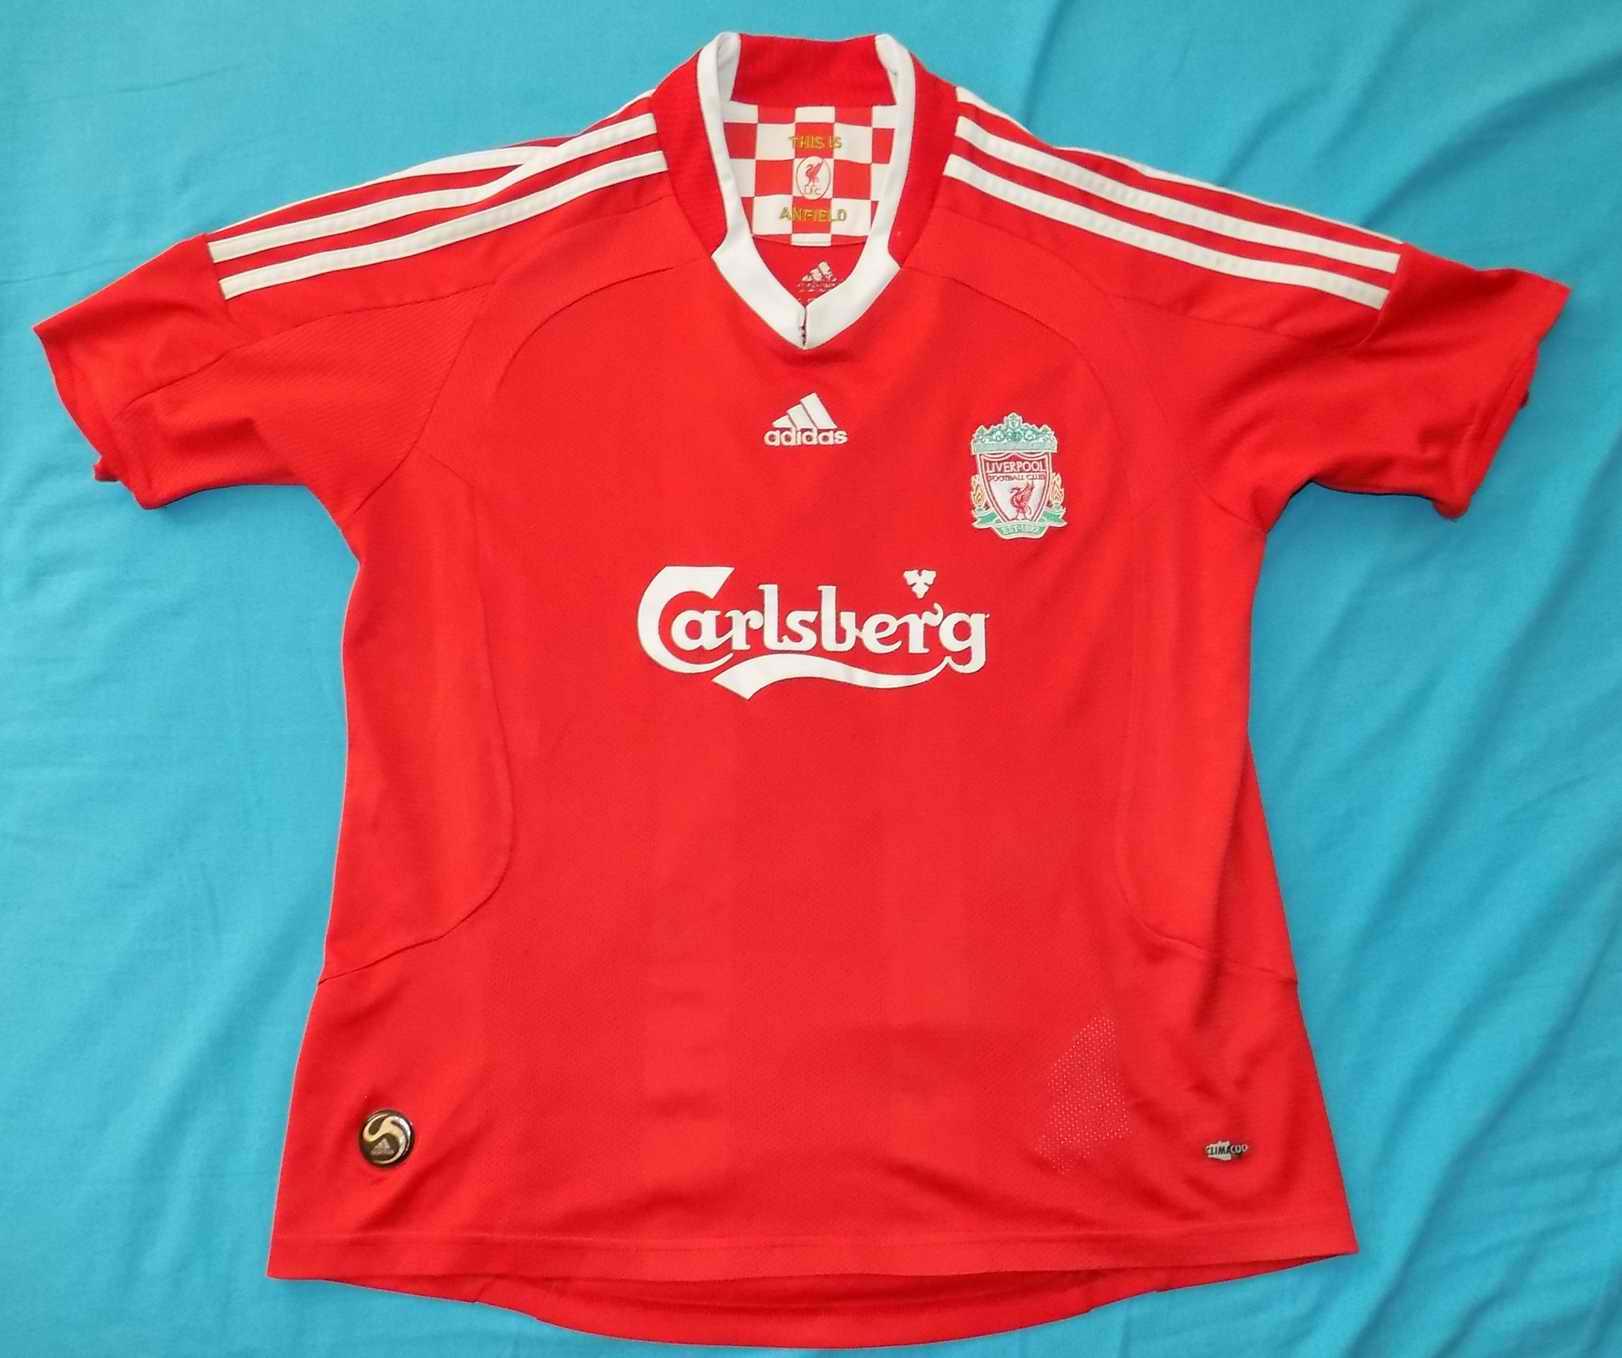 Liverpool Koszulka Adidas rozm.XSS